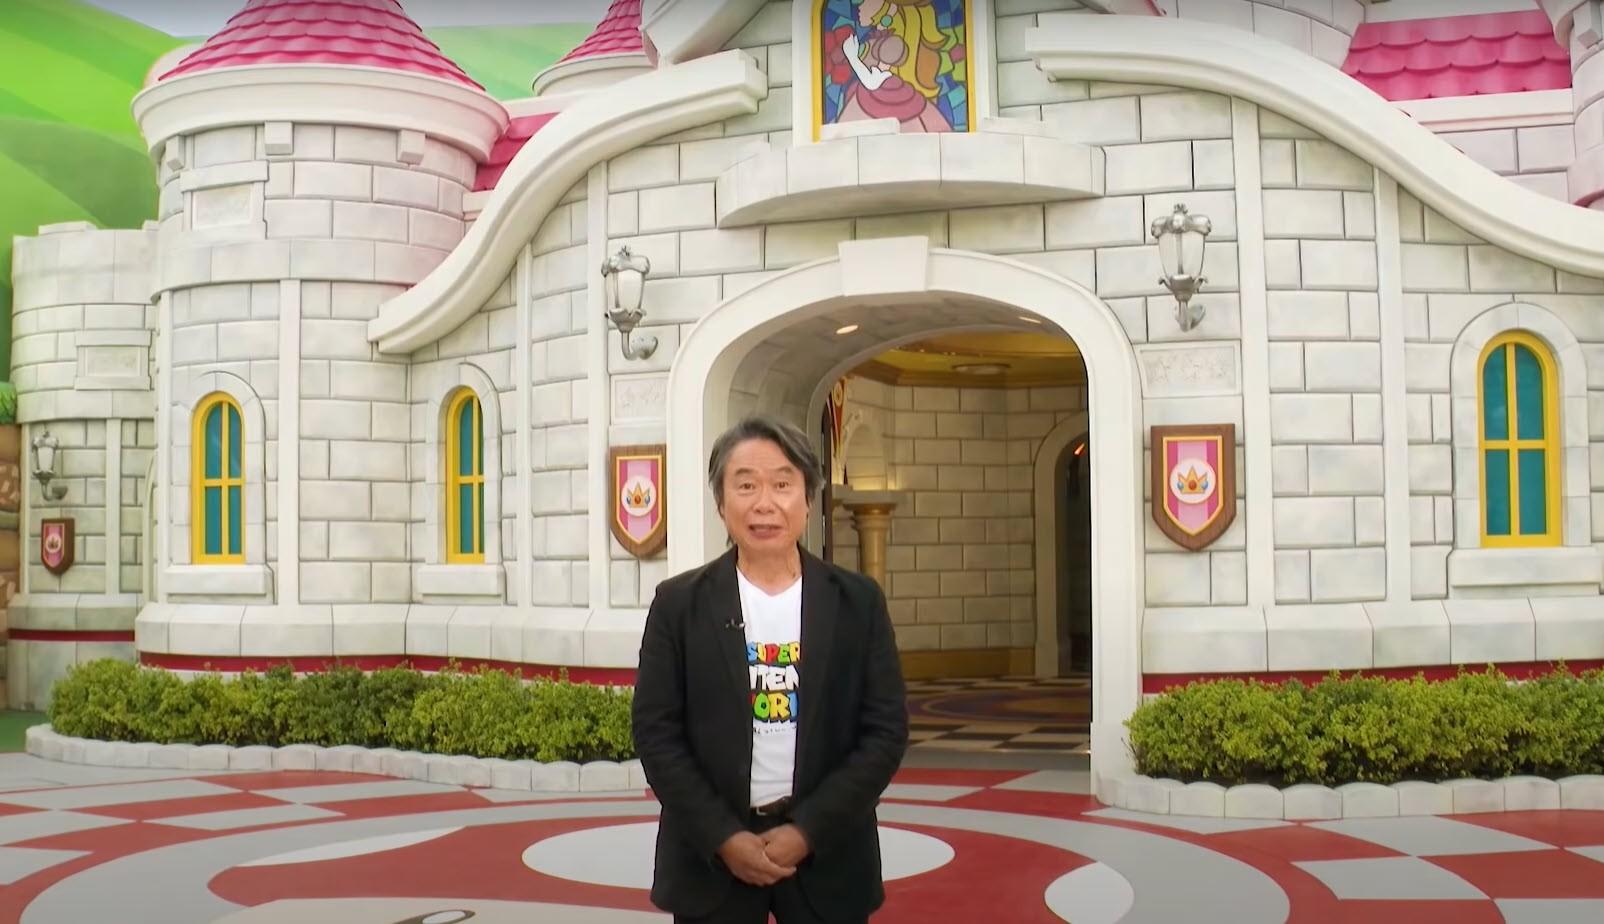 Nintendo-Entwickler Shigeru Miyamoto